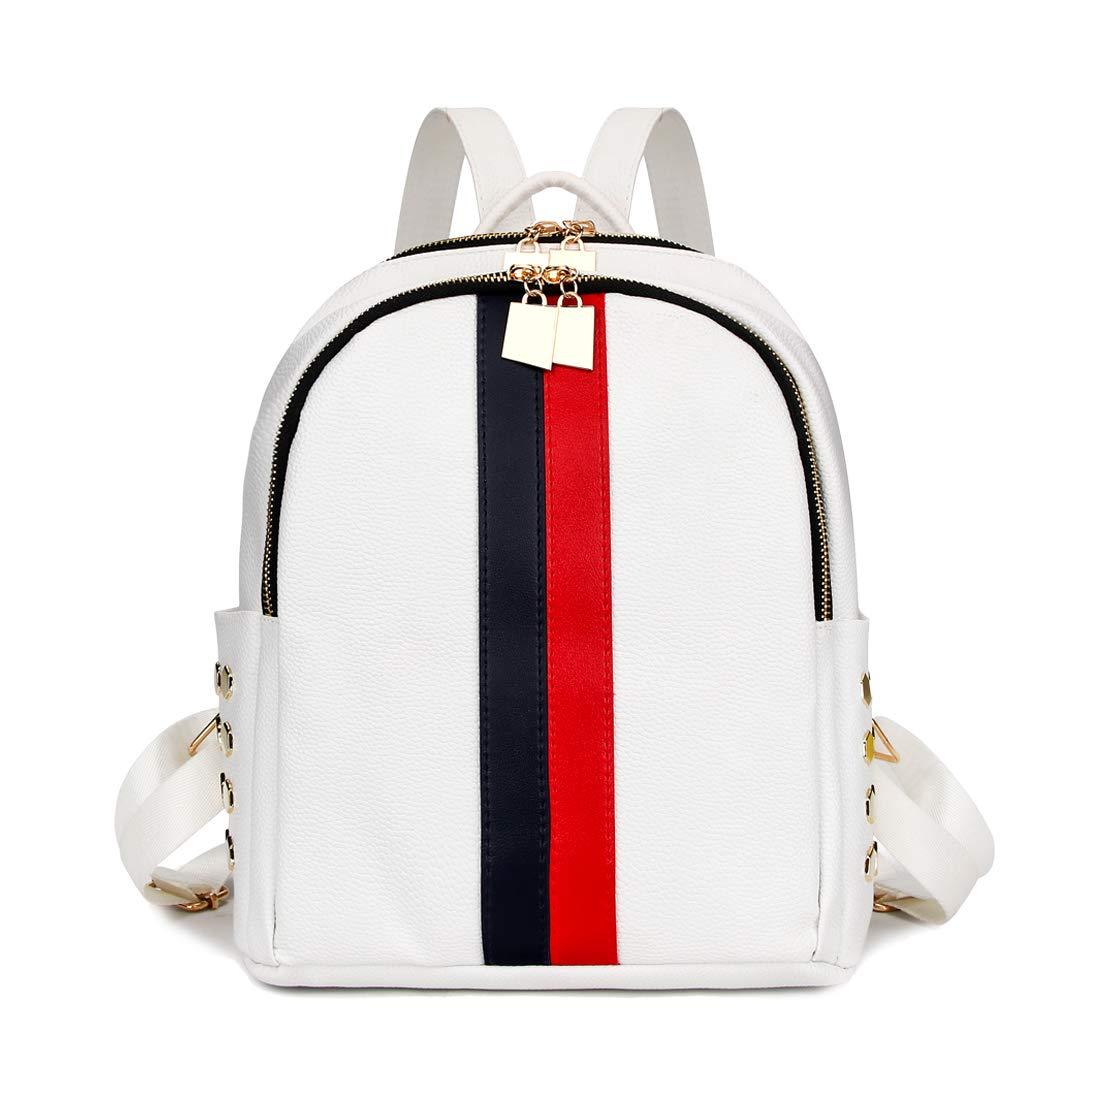 Artwell Women Backpack Purse Cute Mini Leather Rucksack Fashion Small Daypacks Travel Shoulder Handbag for Girls